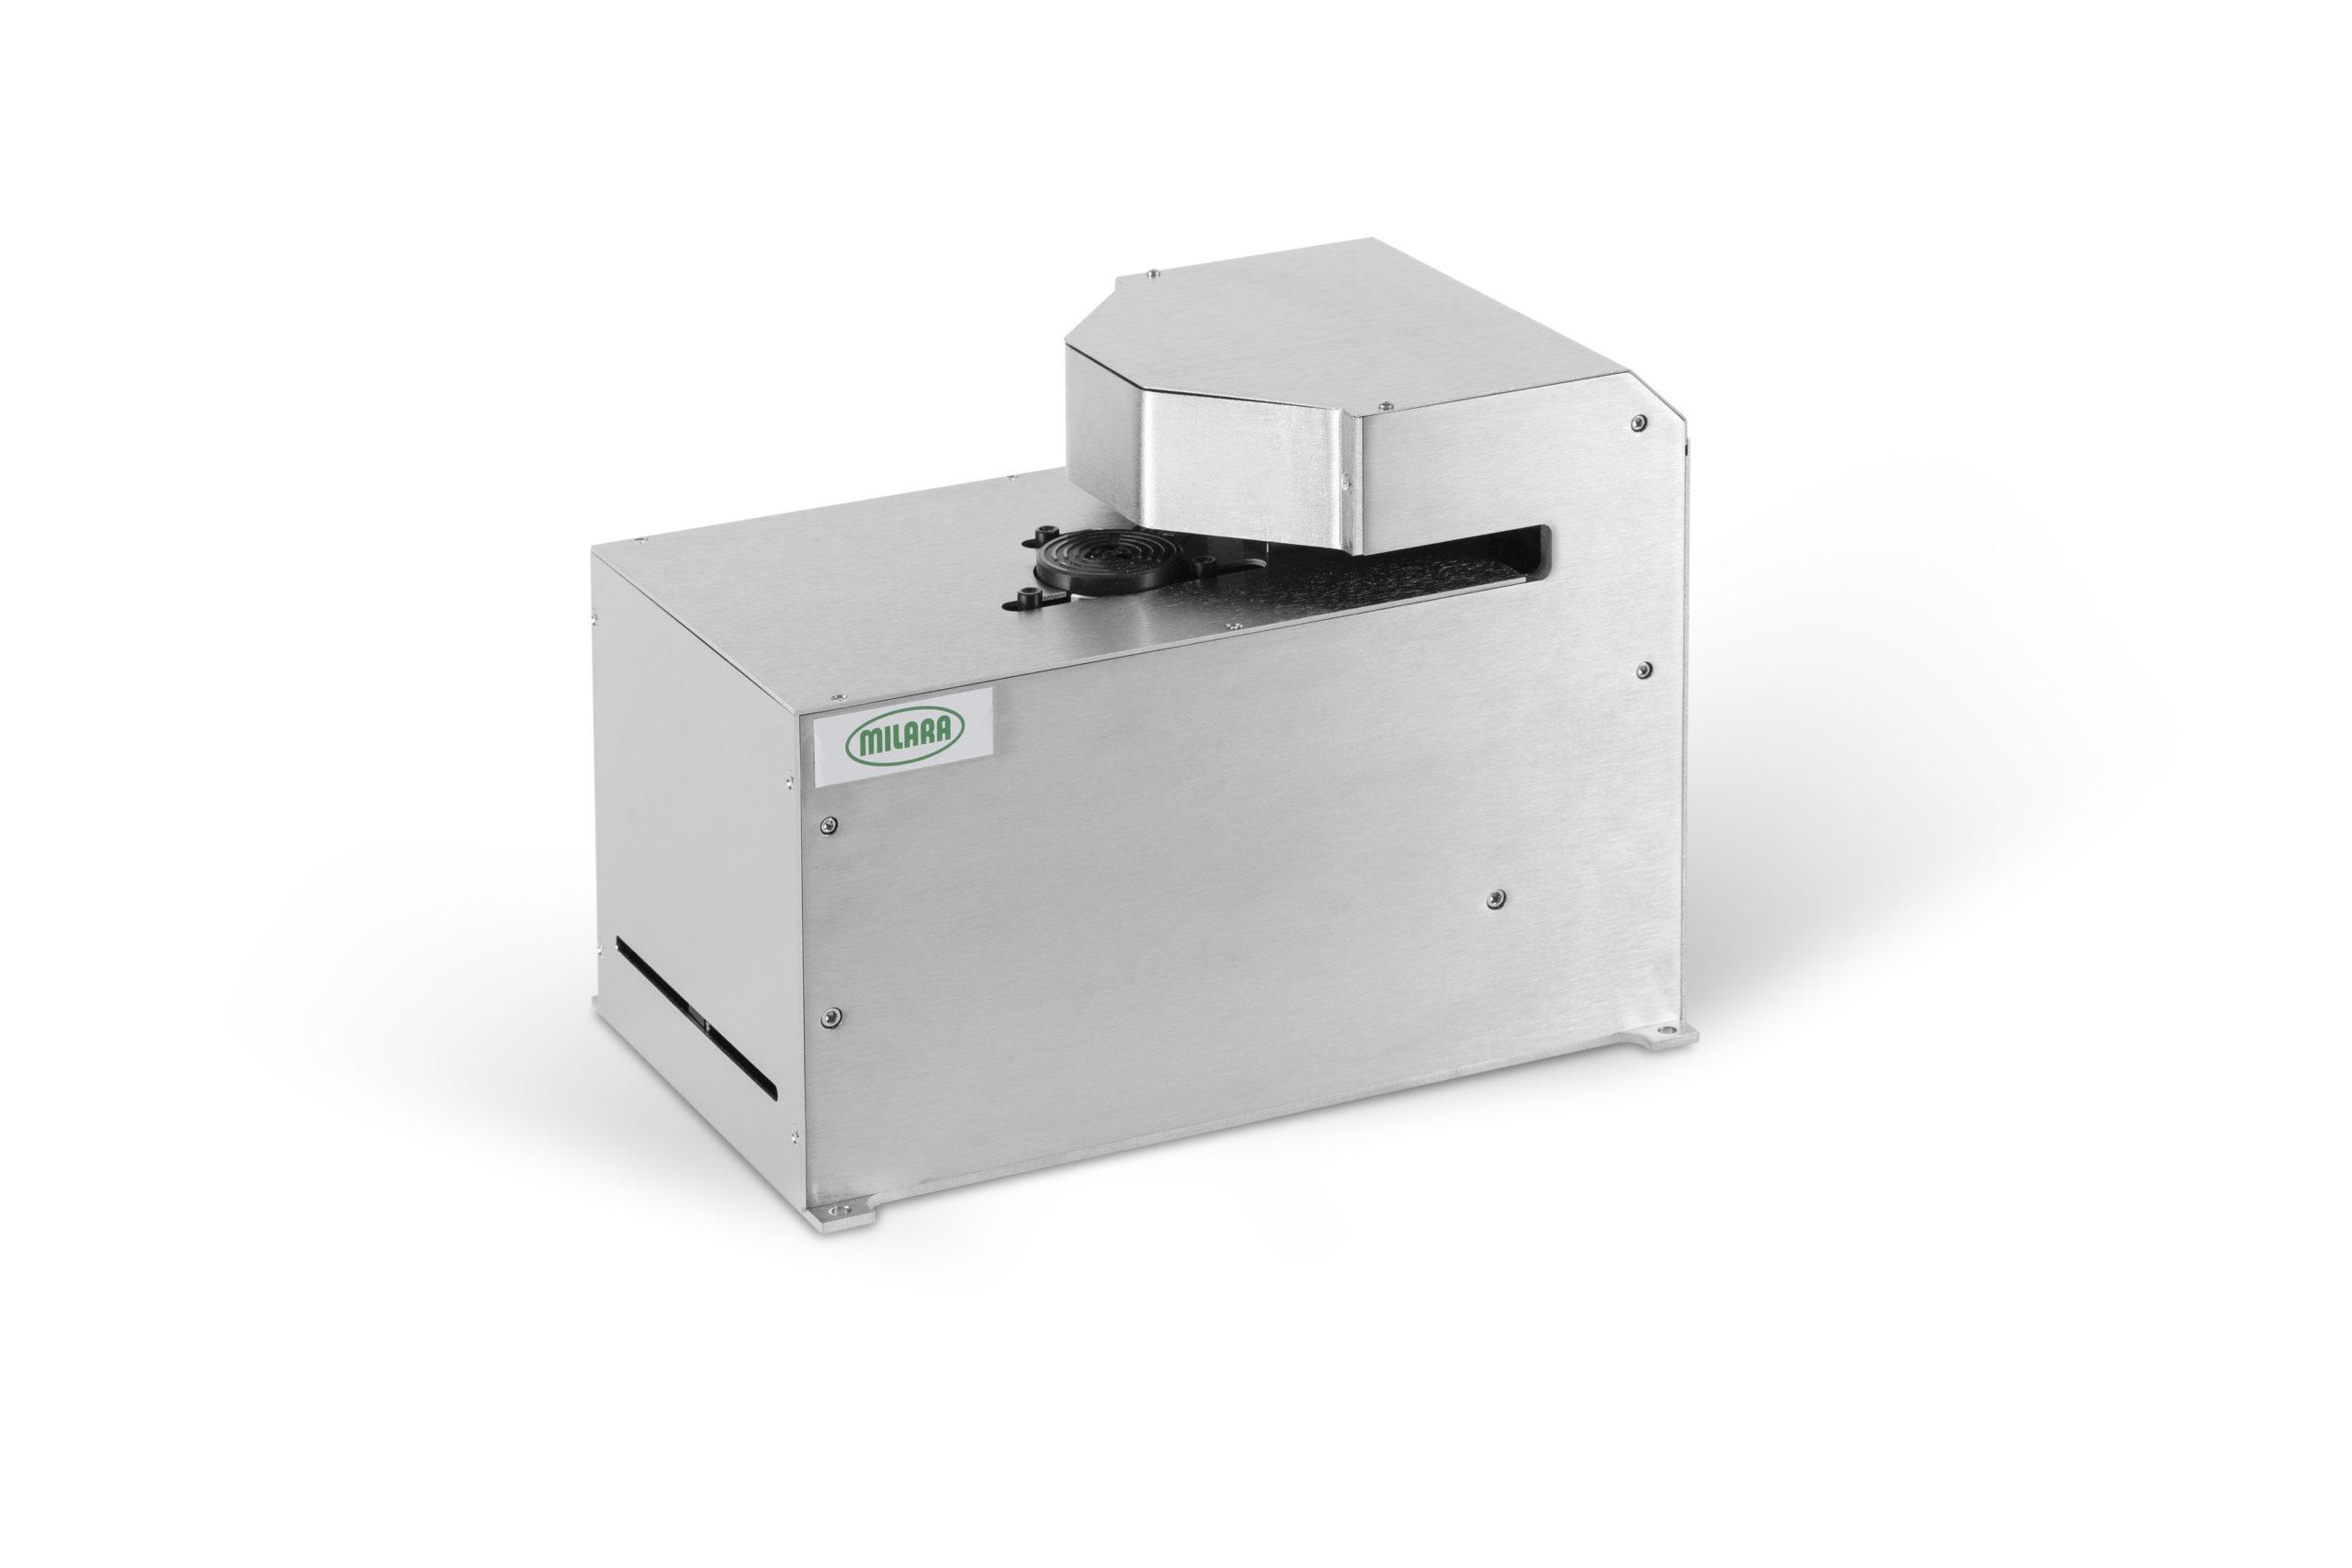 EQUIPE PRE-200 Series Image